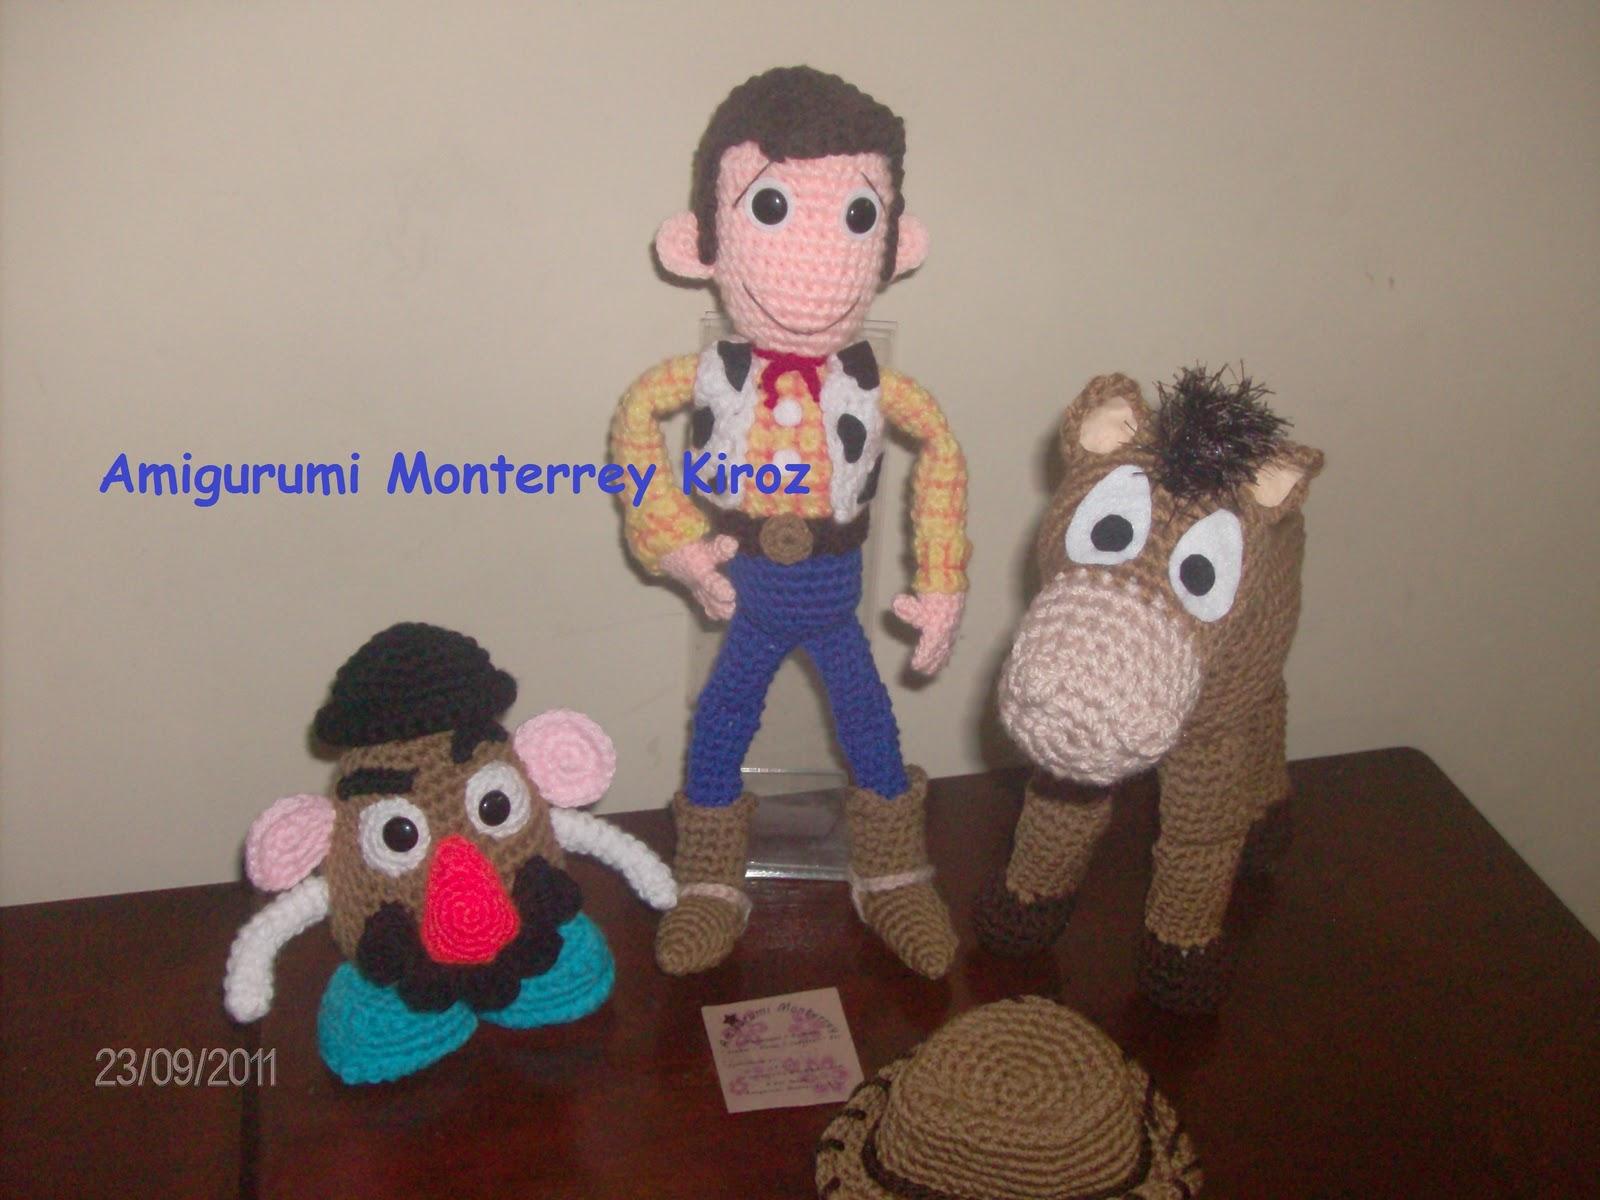 Amigurumi Toy Story : Amigurumi Monterrey: Toy Story Crochet